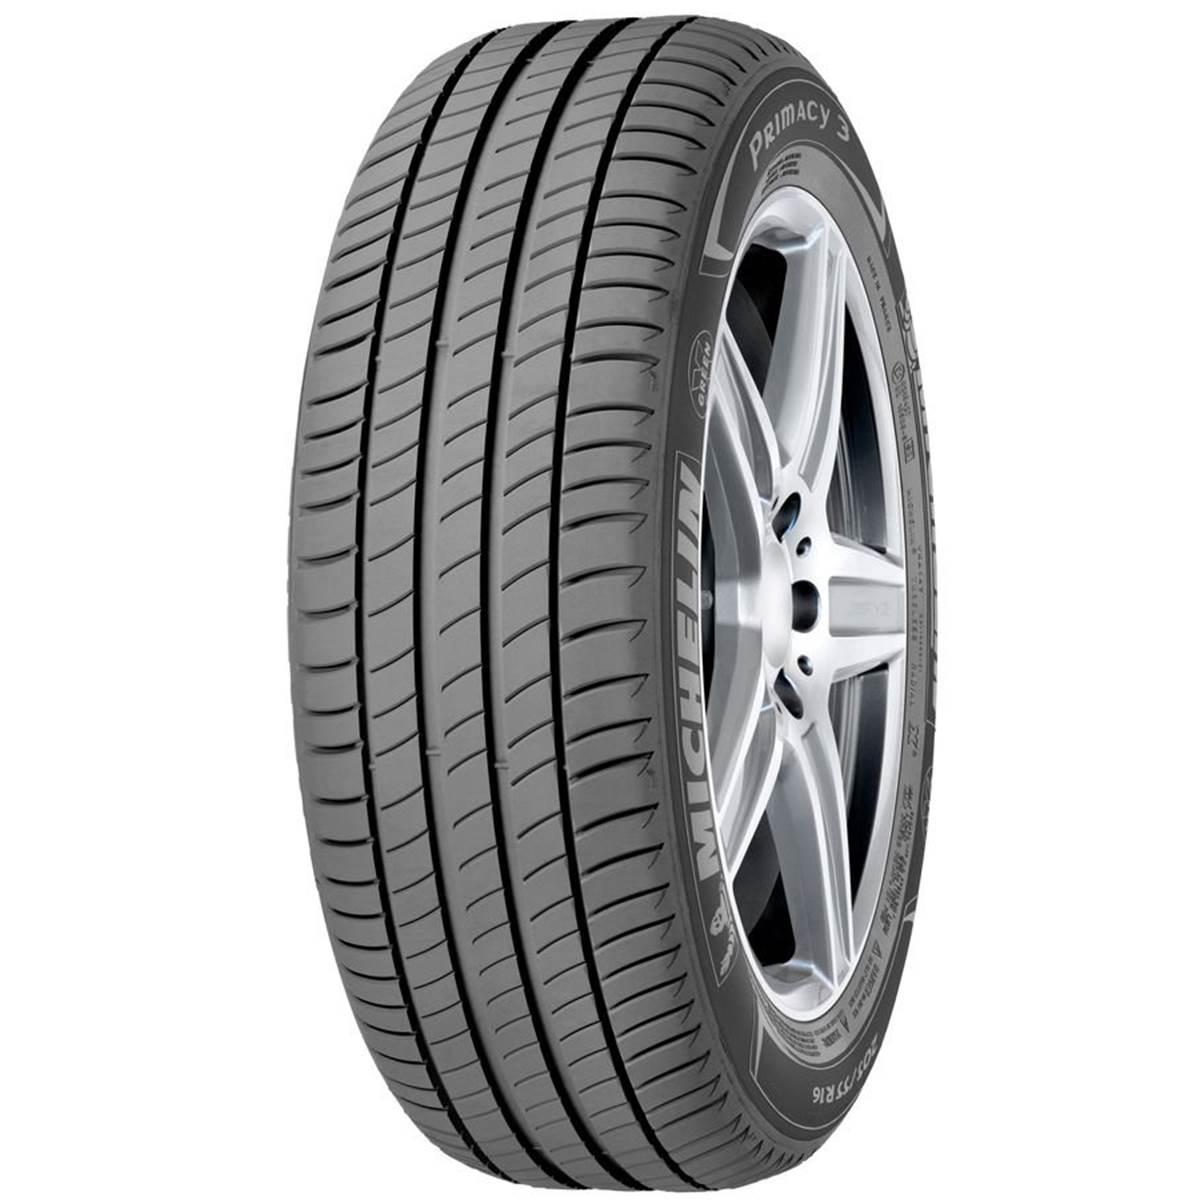 Michelin Primacy 3 pneu